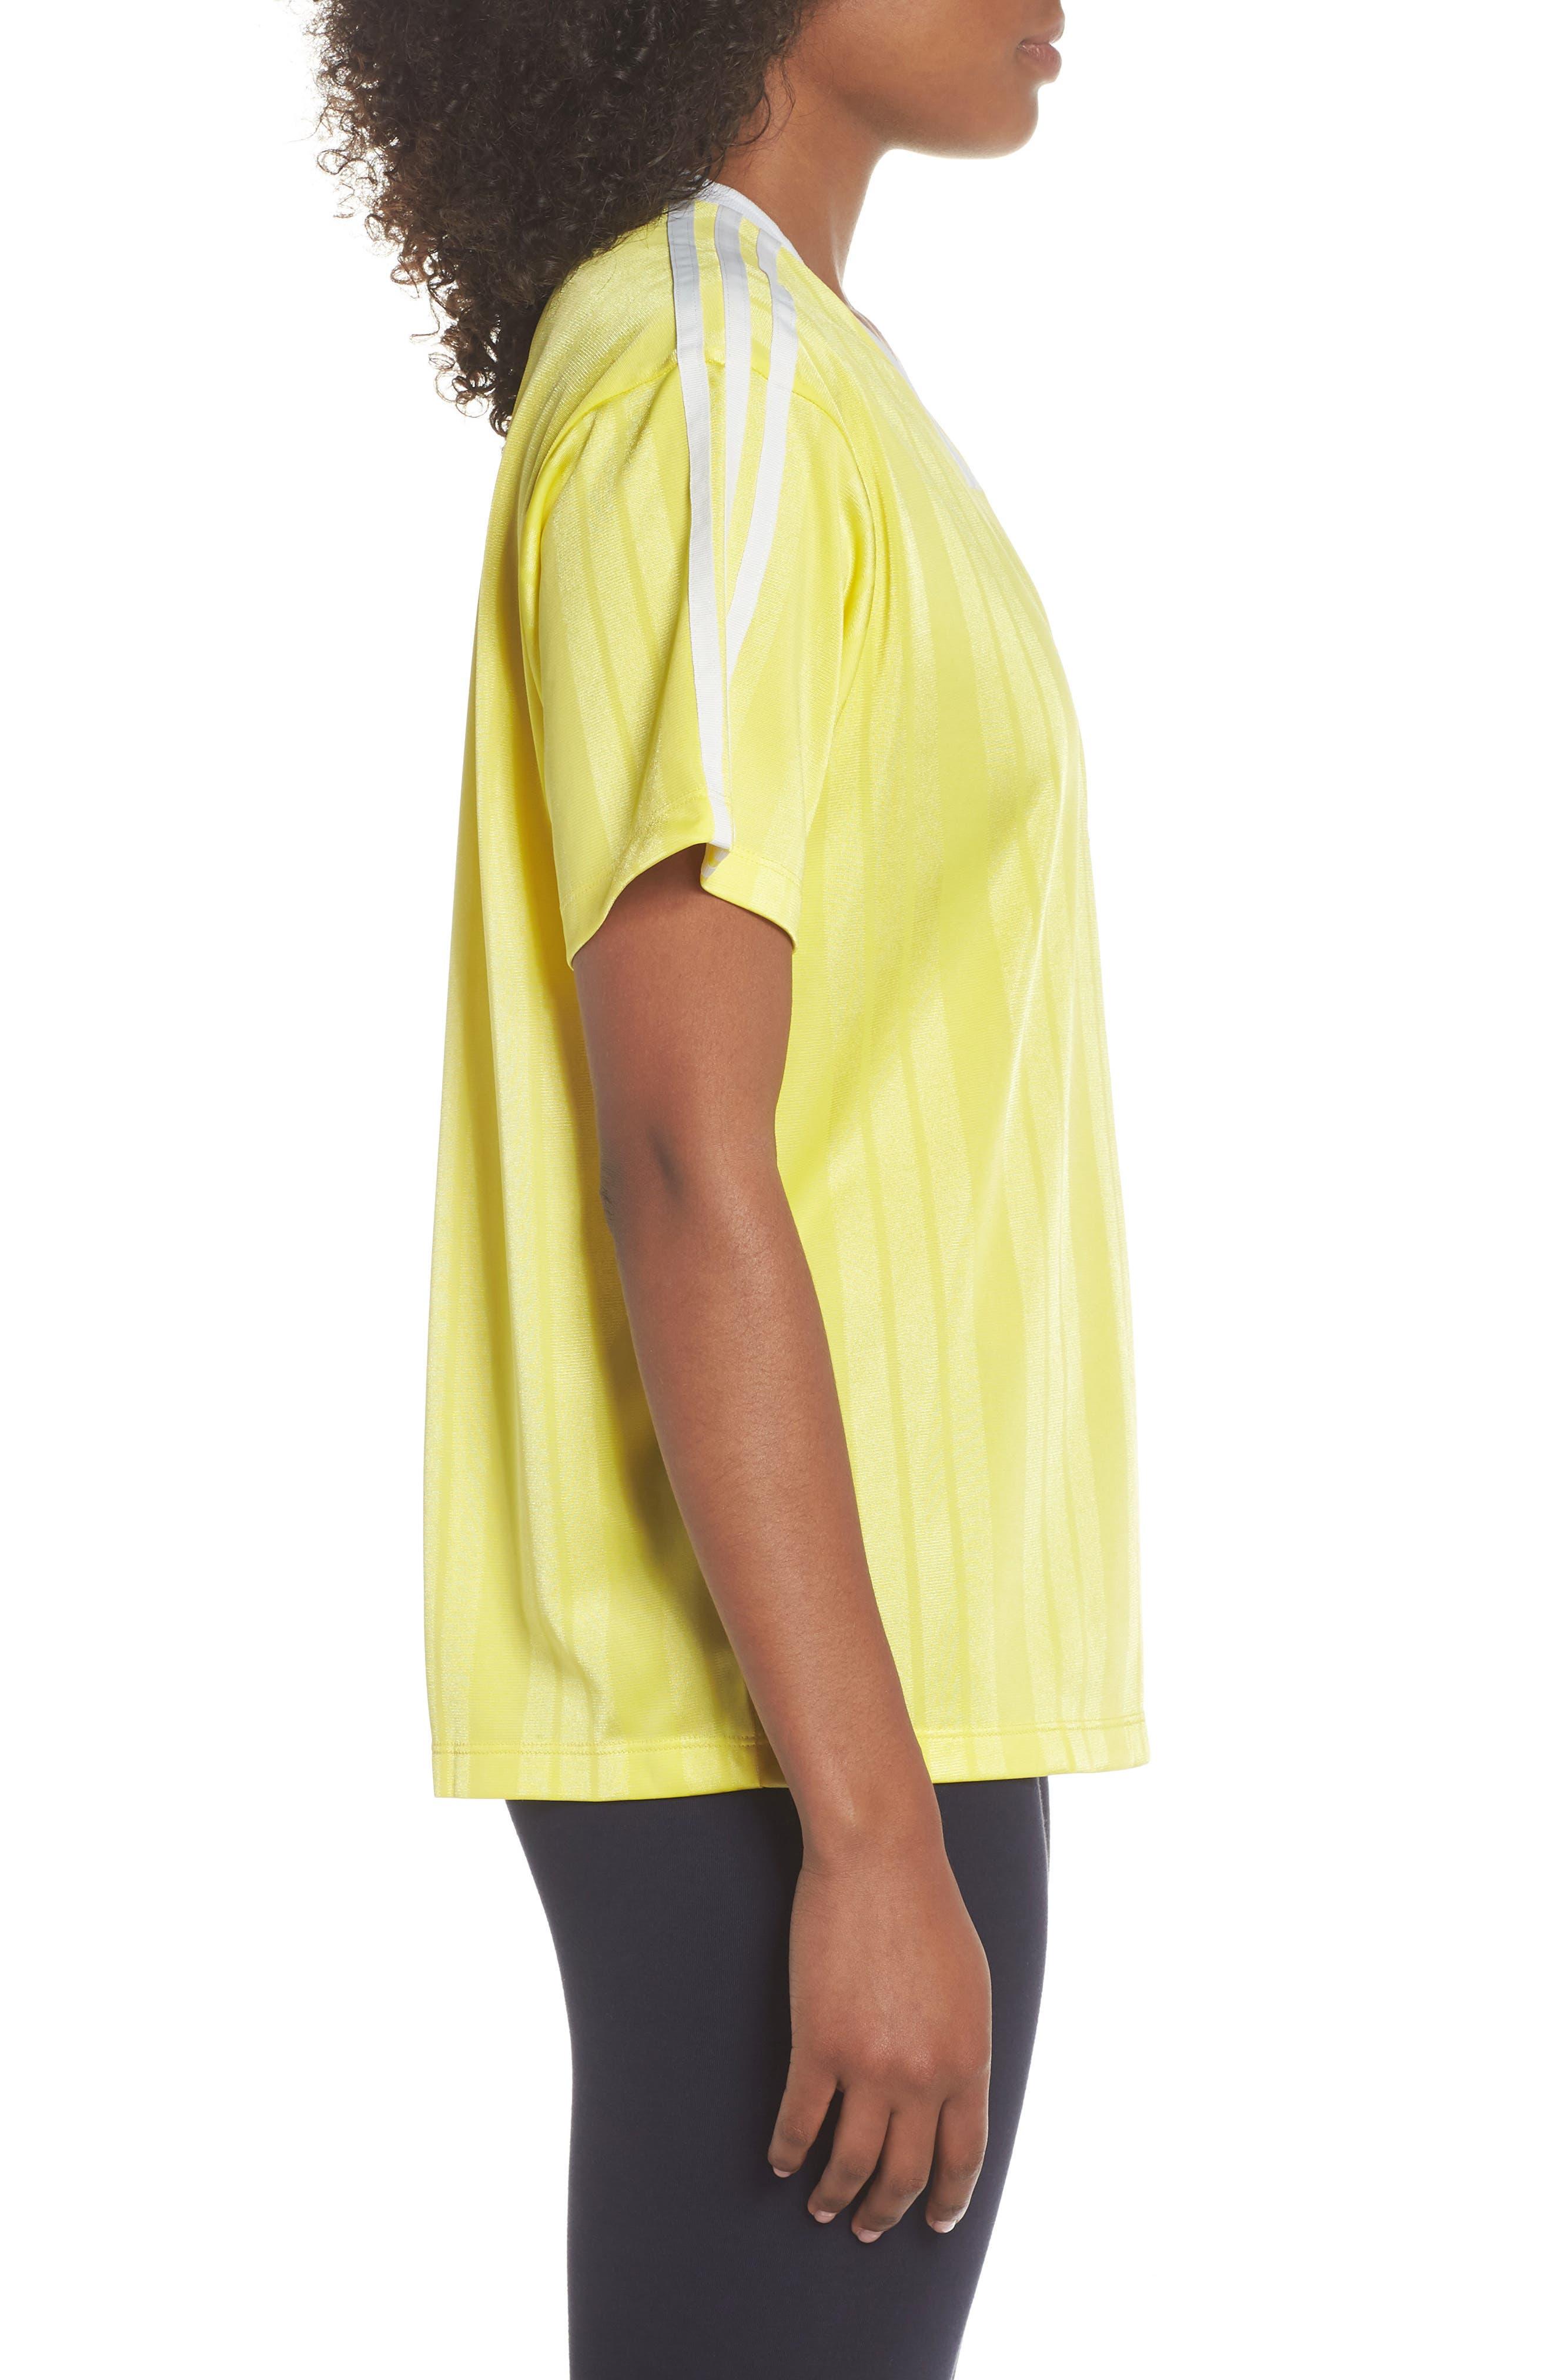 Originals Fashion League Jersey Tee,                             Alternate thumbnail 3, color,                             Prime Yellow